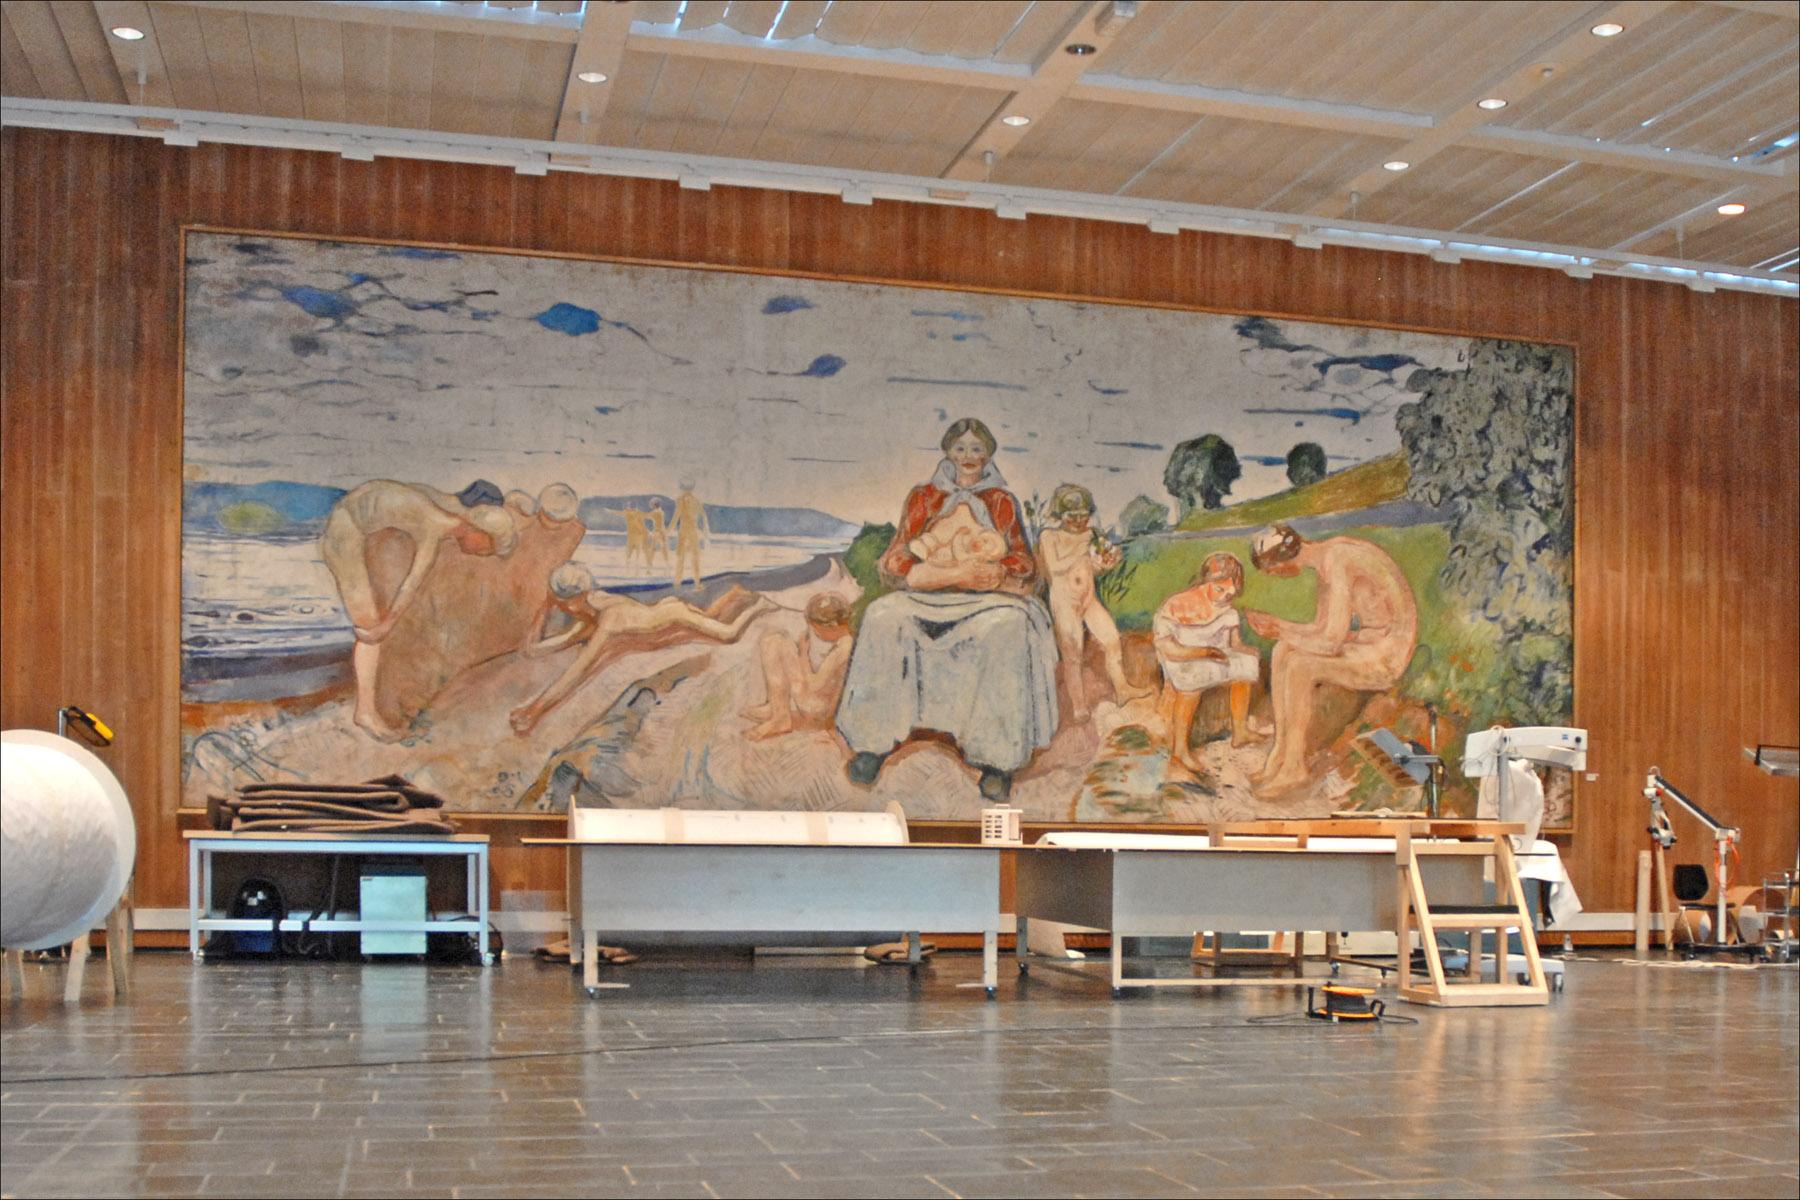 Munch Gallery Oslo Munch Museum Oslo